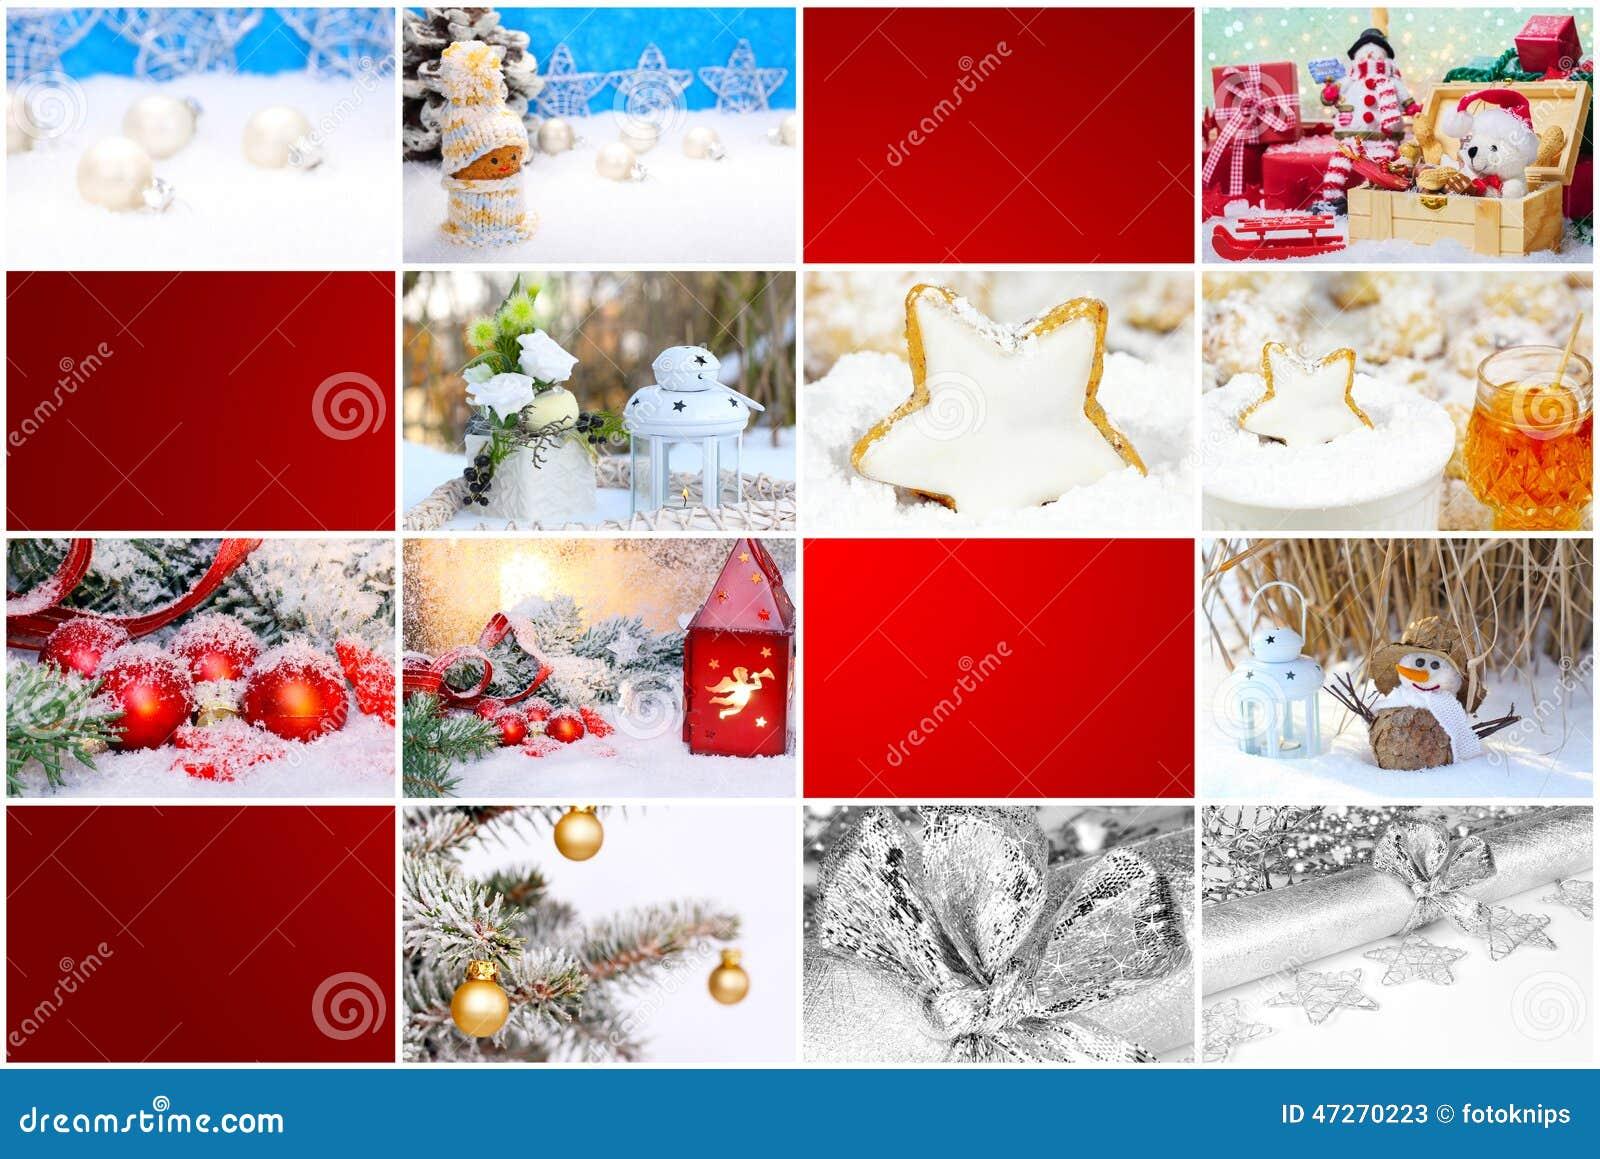 Gift Card, Christmas Trailer Stock Image - Image of teddy, card ...